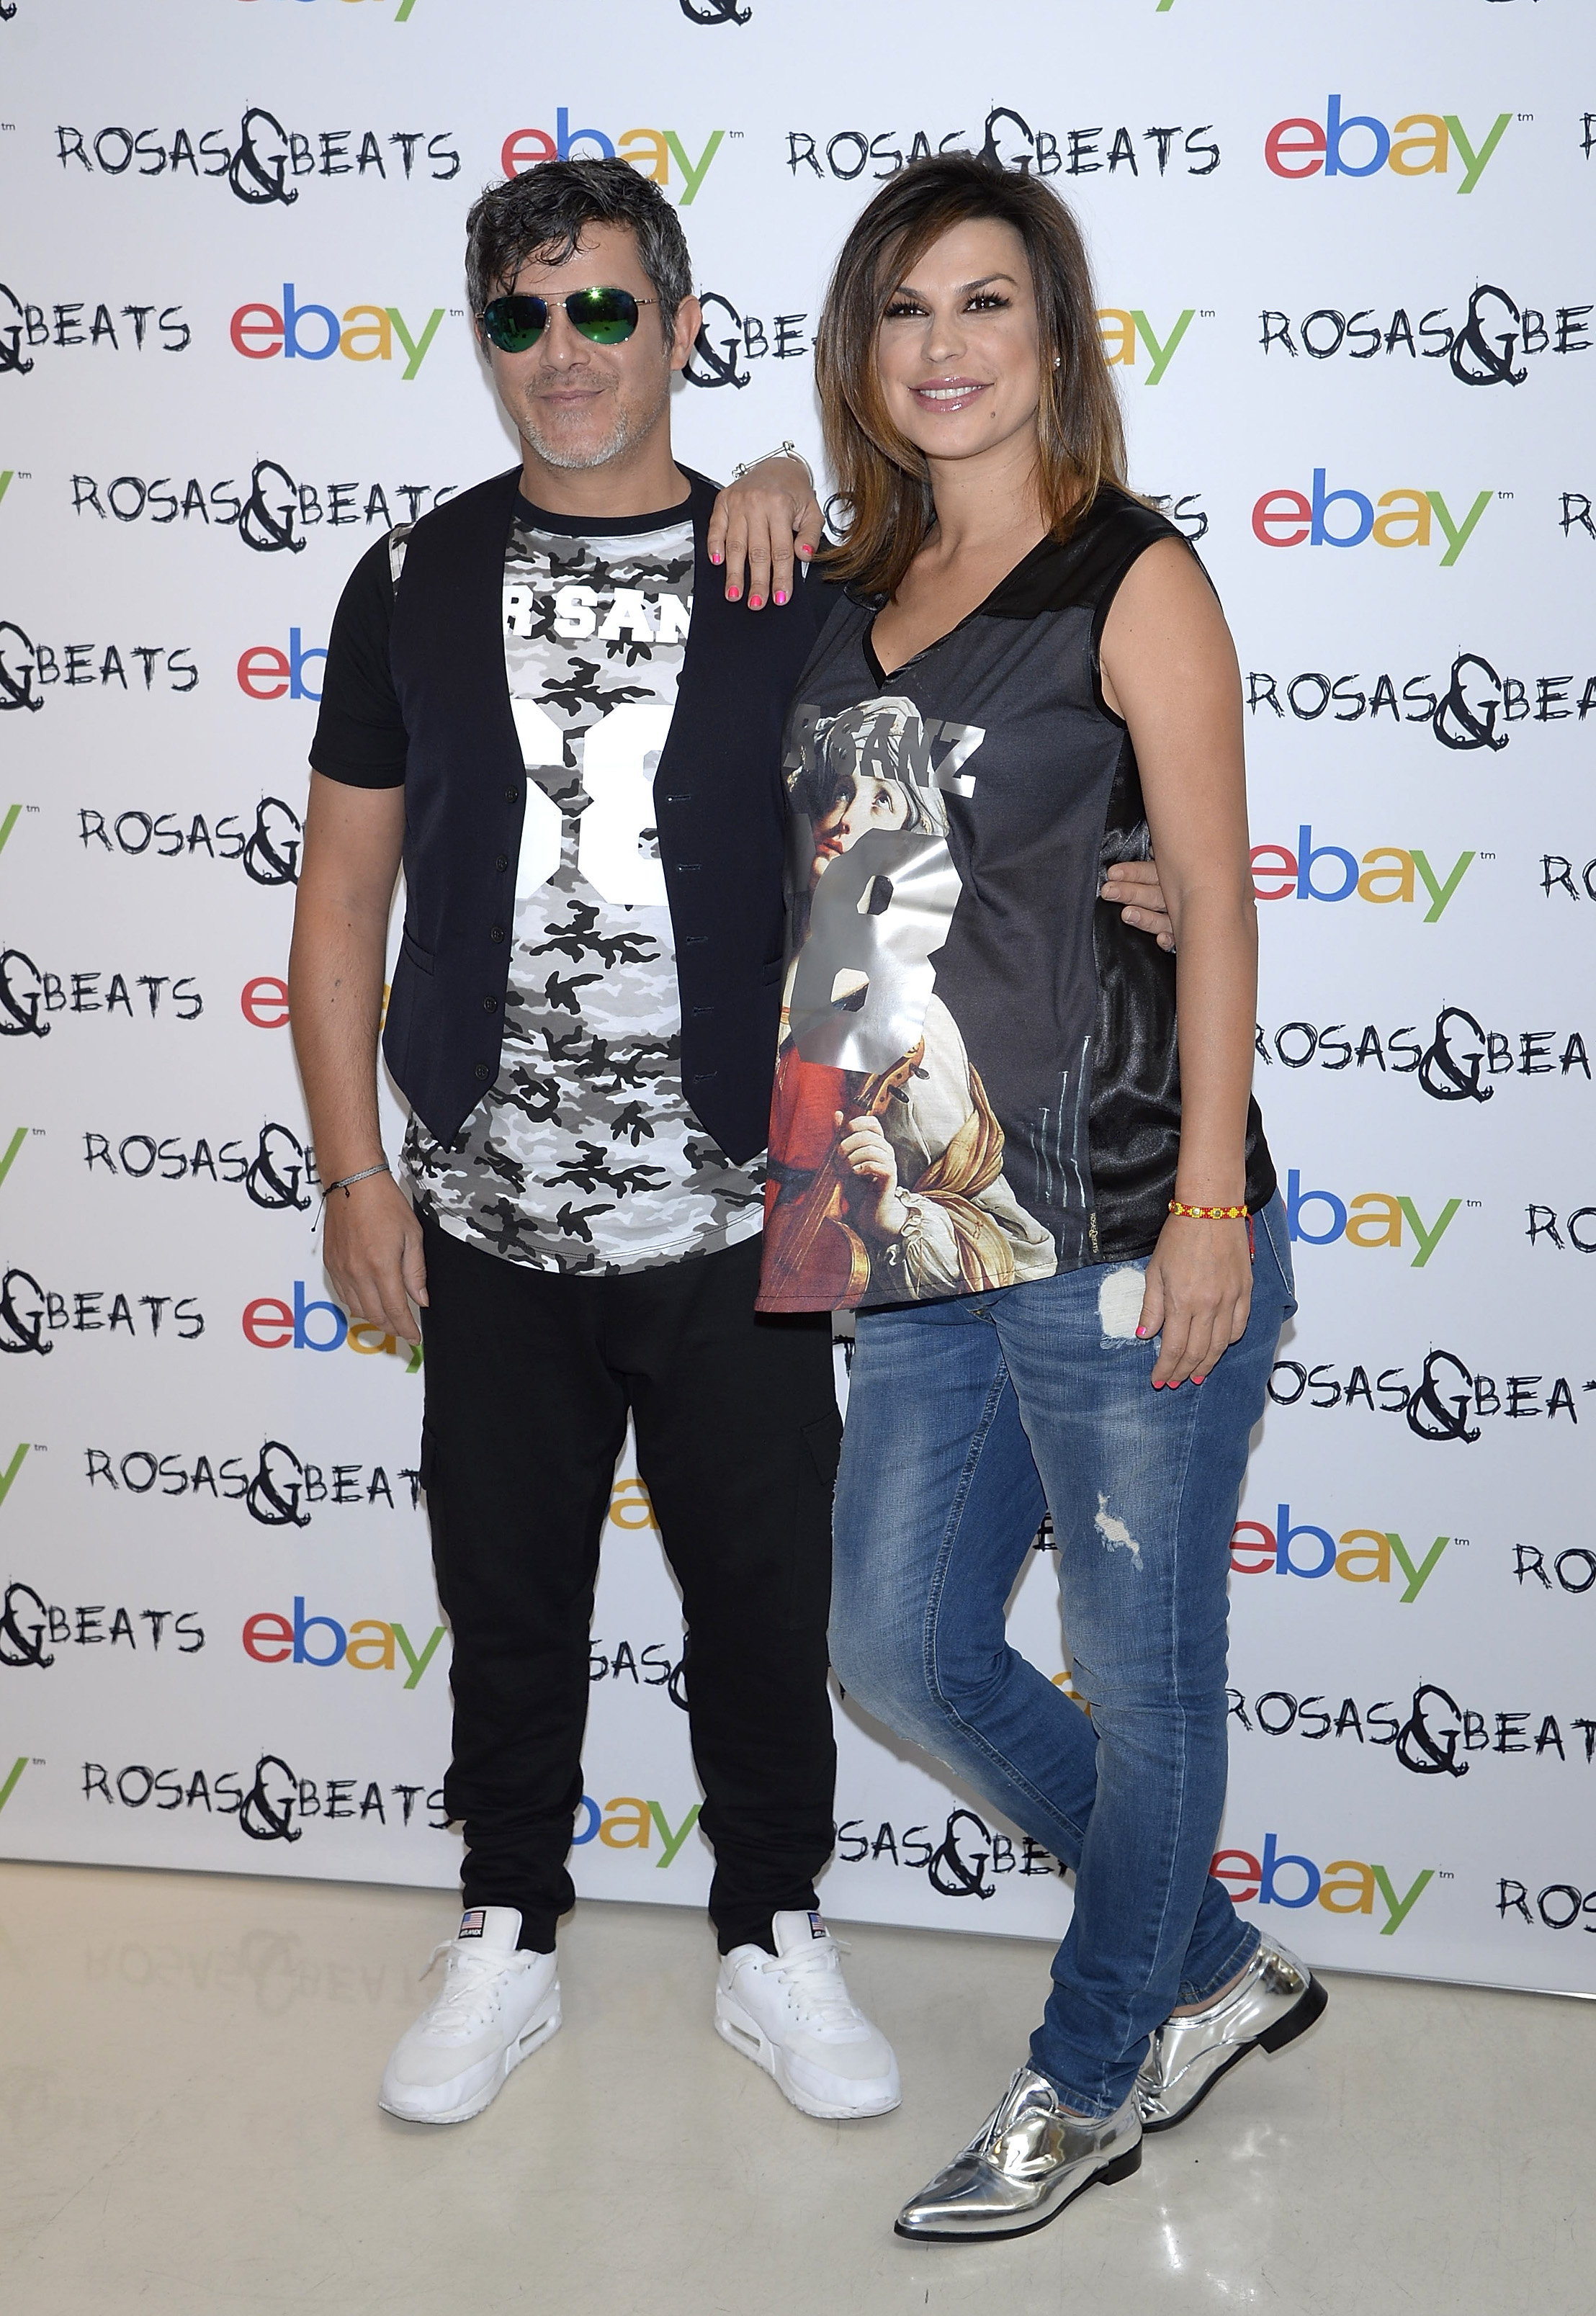 Alejandro Sanz and Raquel Perera Launch Rosas & Beats Collection